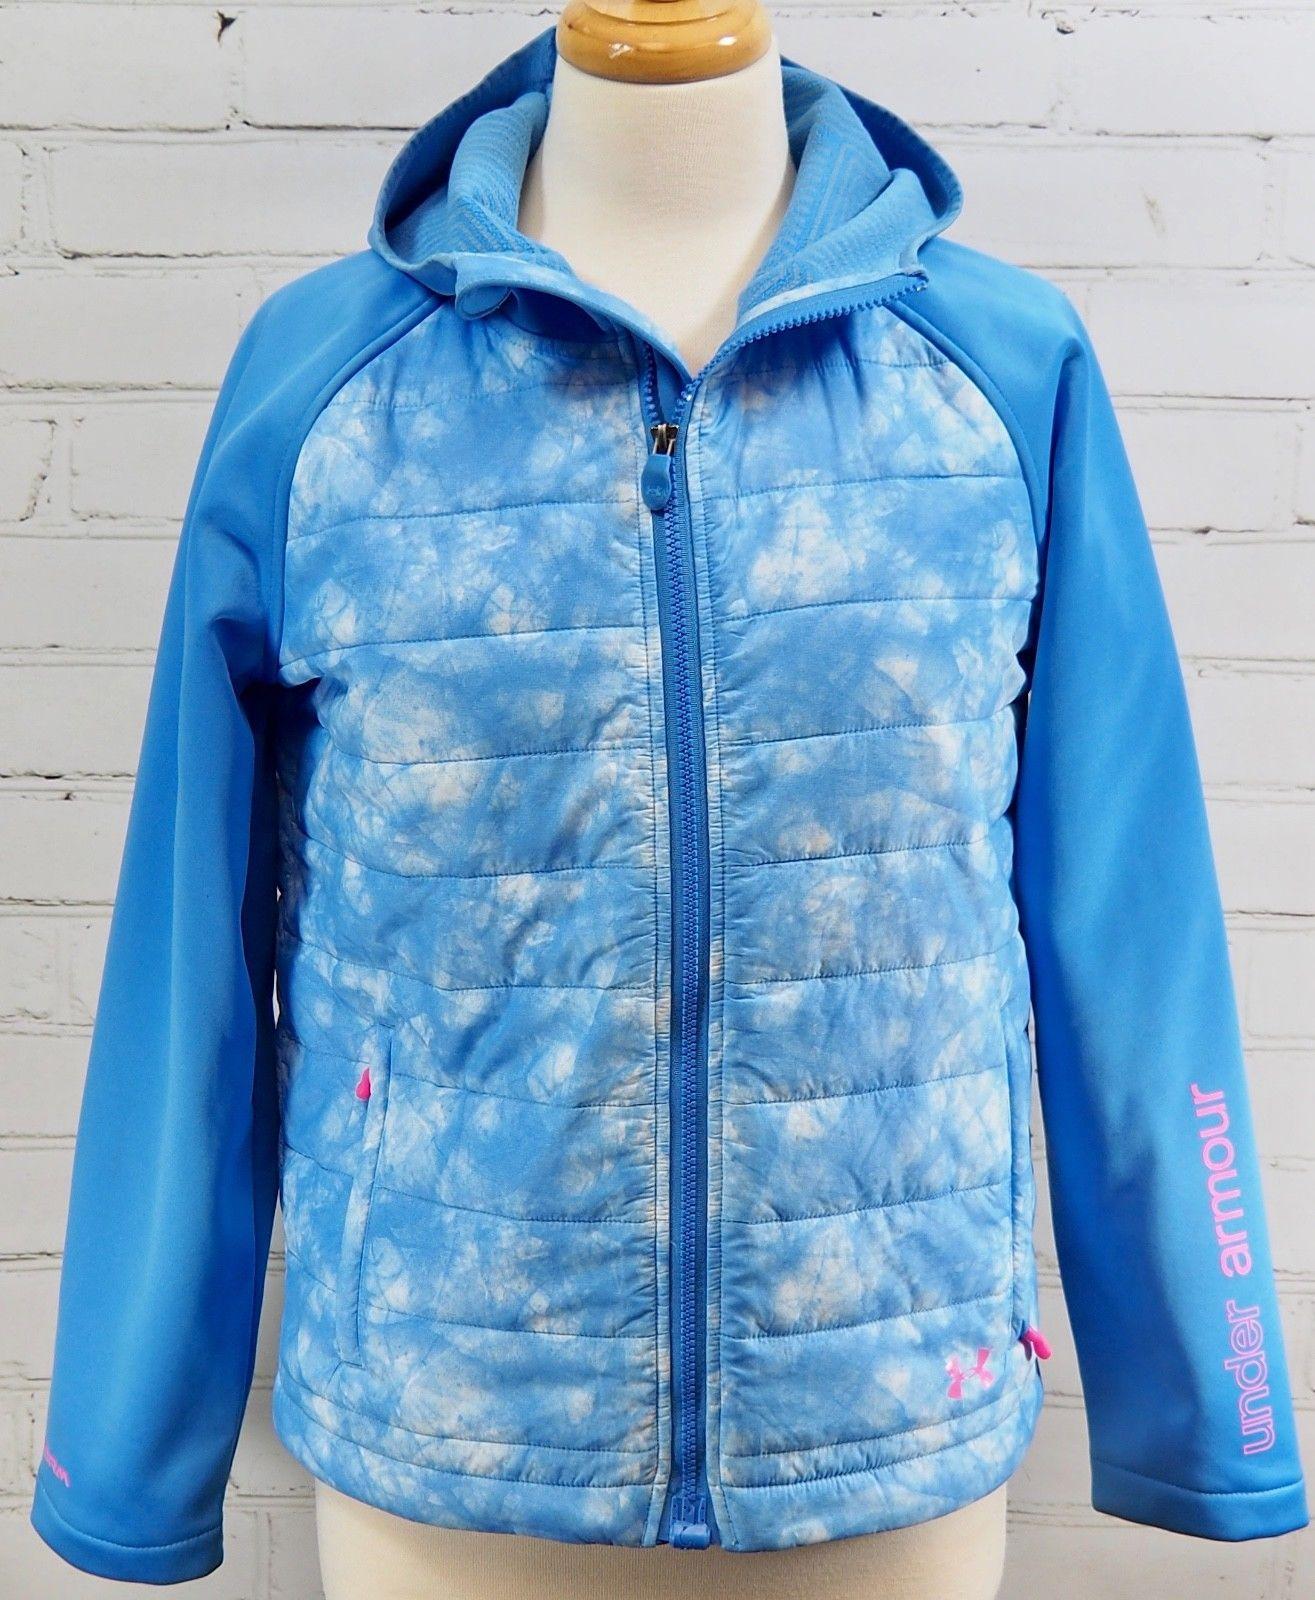 889afb6b4 57. 57. Under Armour Werewolf Coldgear Infrared Storm Girls Hooded Jacket  Coat YXL 18-20 · Under Armour Werewolf ...